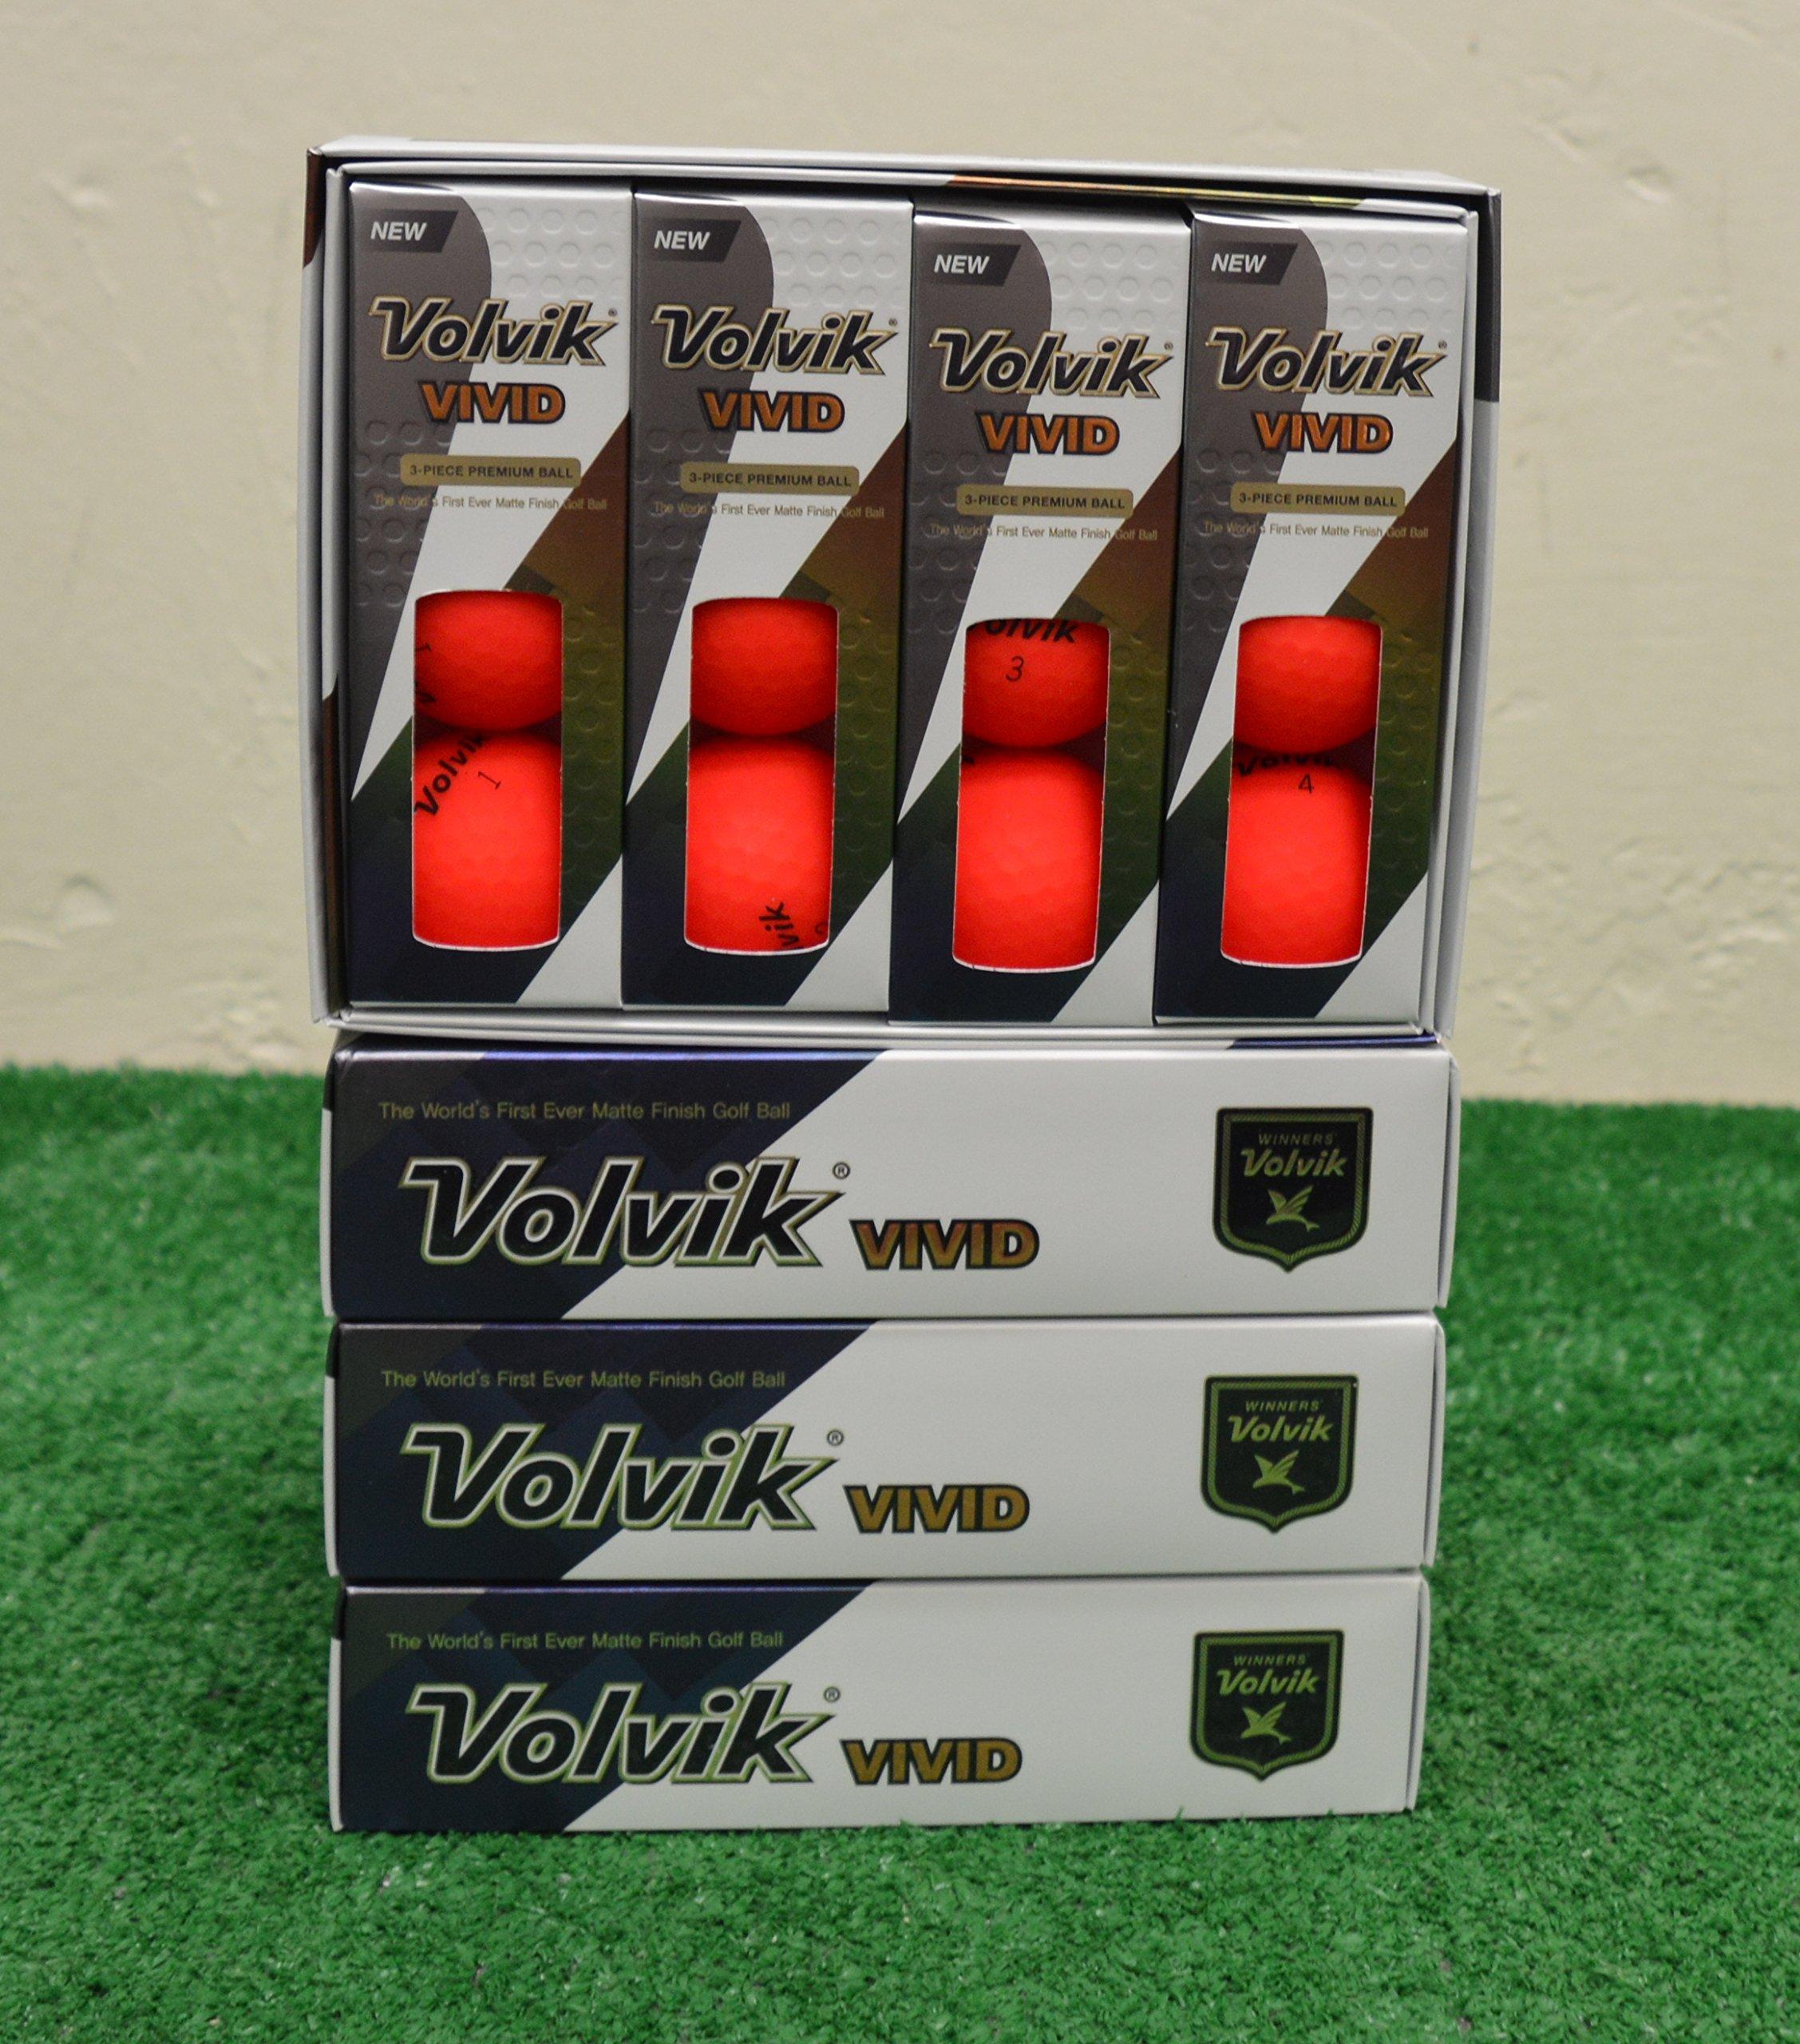 4 Dozen 2018 Volvik Vivid - Matte Red Golf Balls